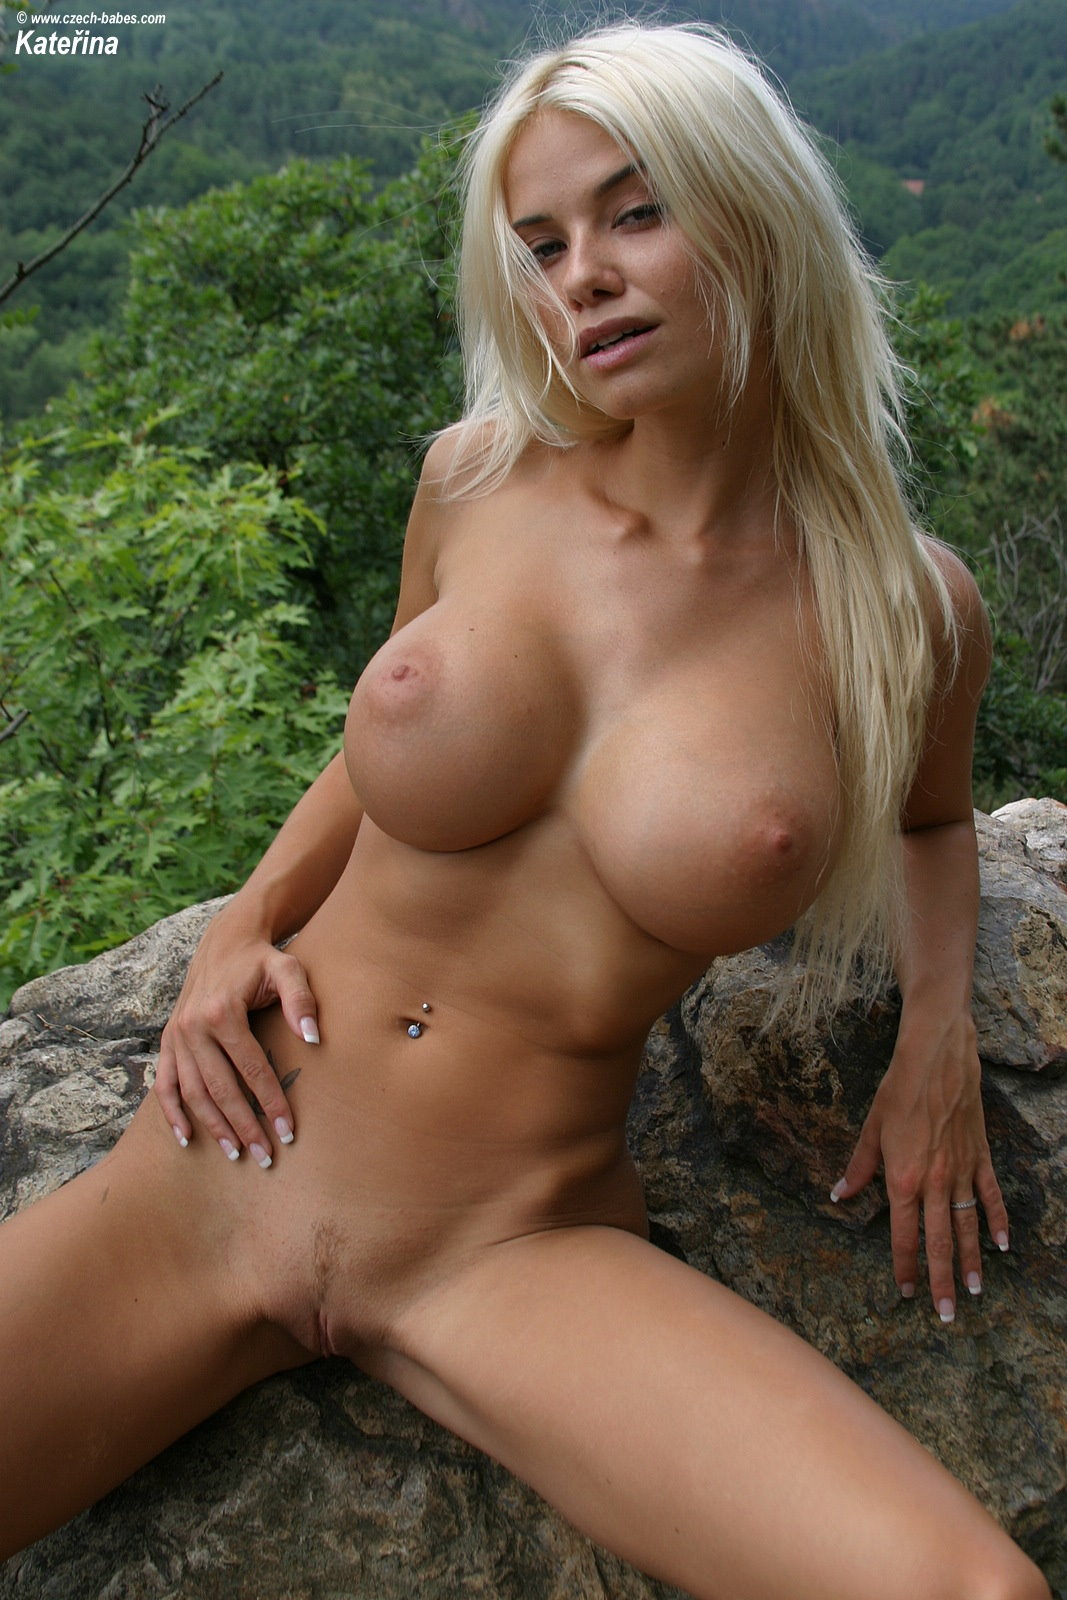 katerina-nude-mountain-lingerie-huge-tits-blonde-18